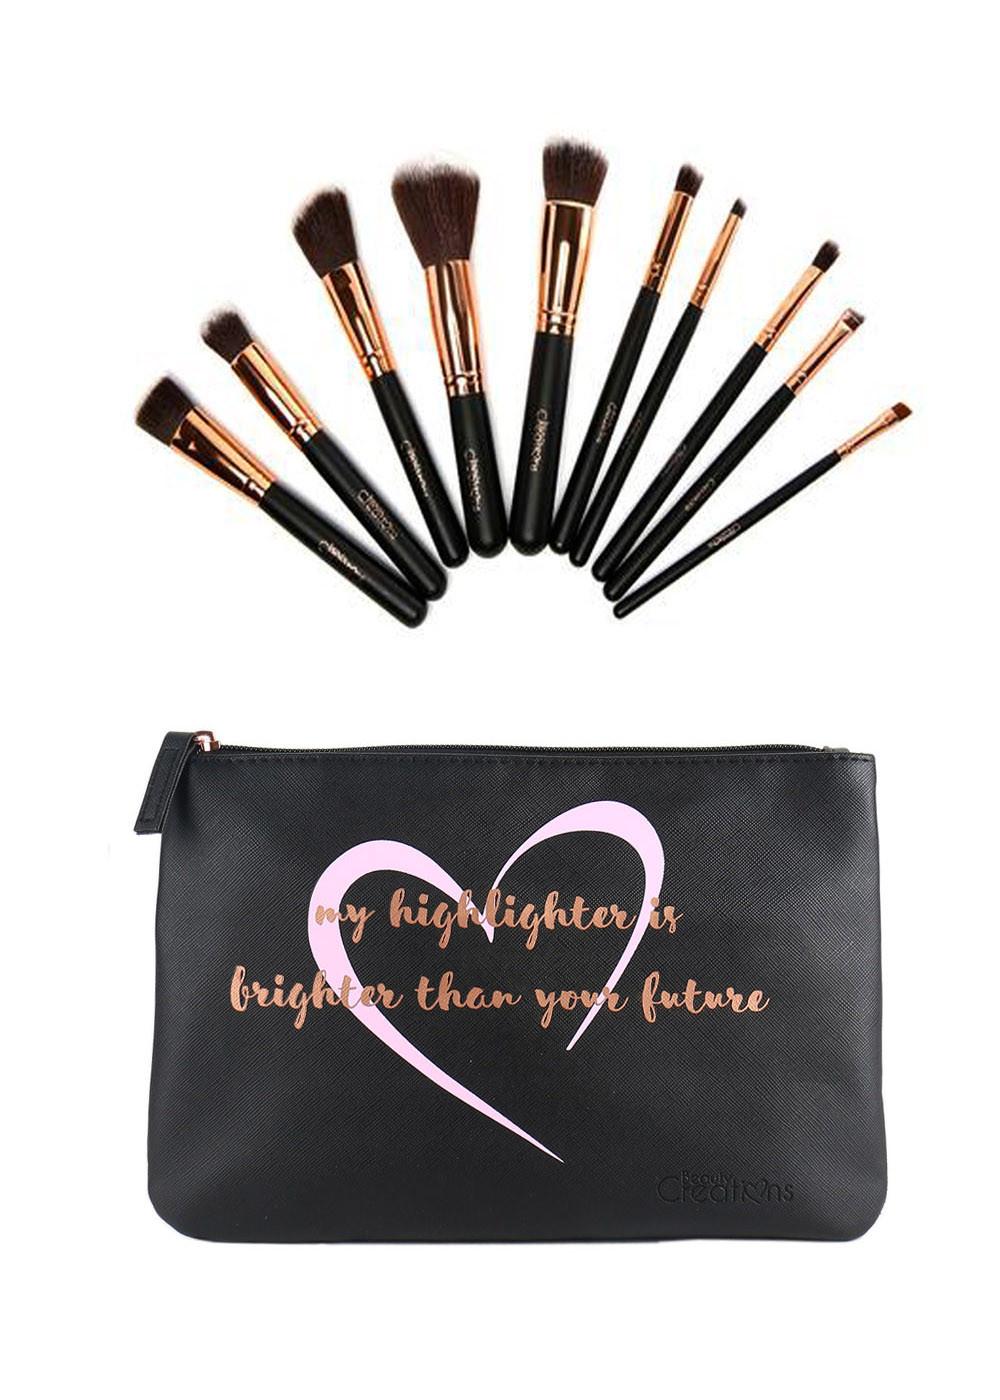 Jacqueline Deviante Cosmetics Beauty Creations Angel Glow Highlight Palette Leia 35 Pro 1599 1999 Sale 10bsr5 1200 1